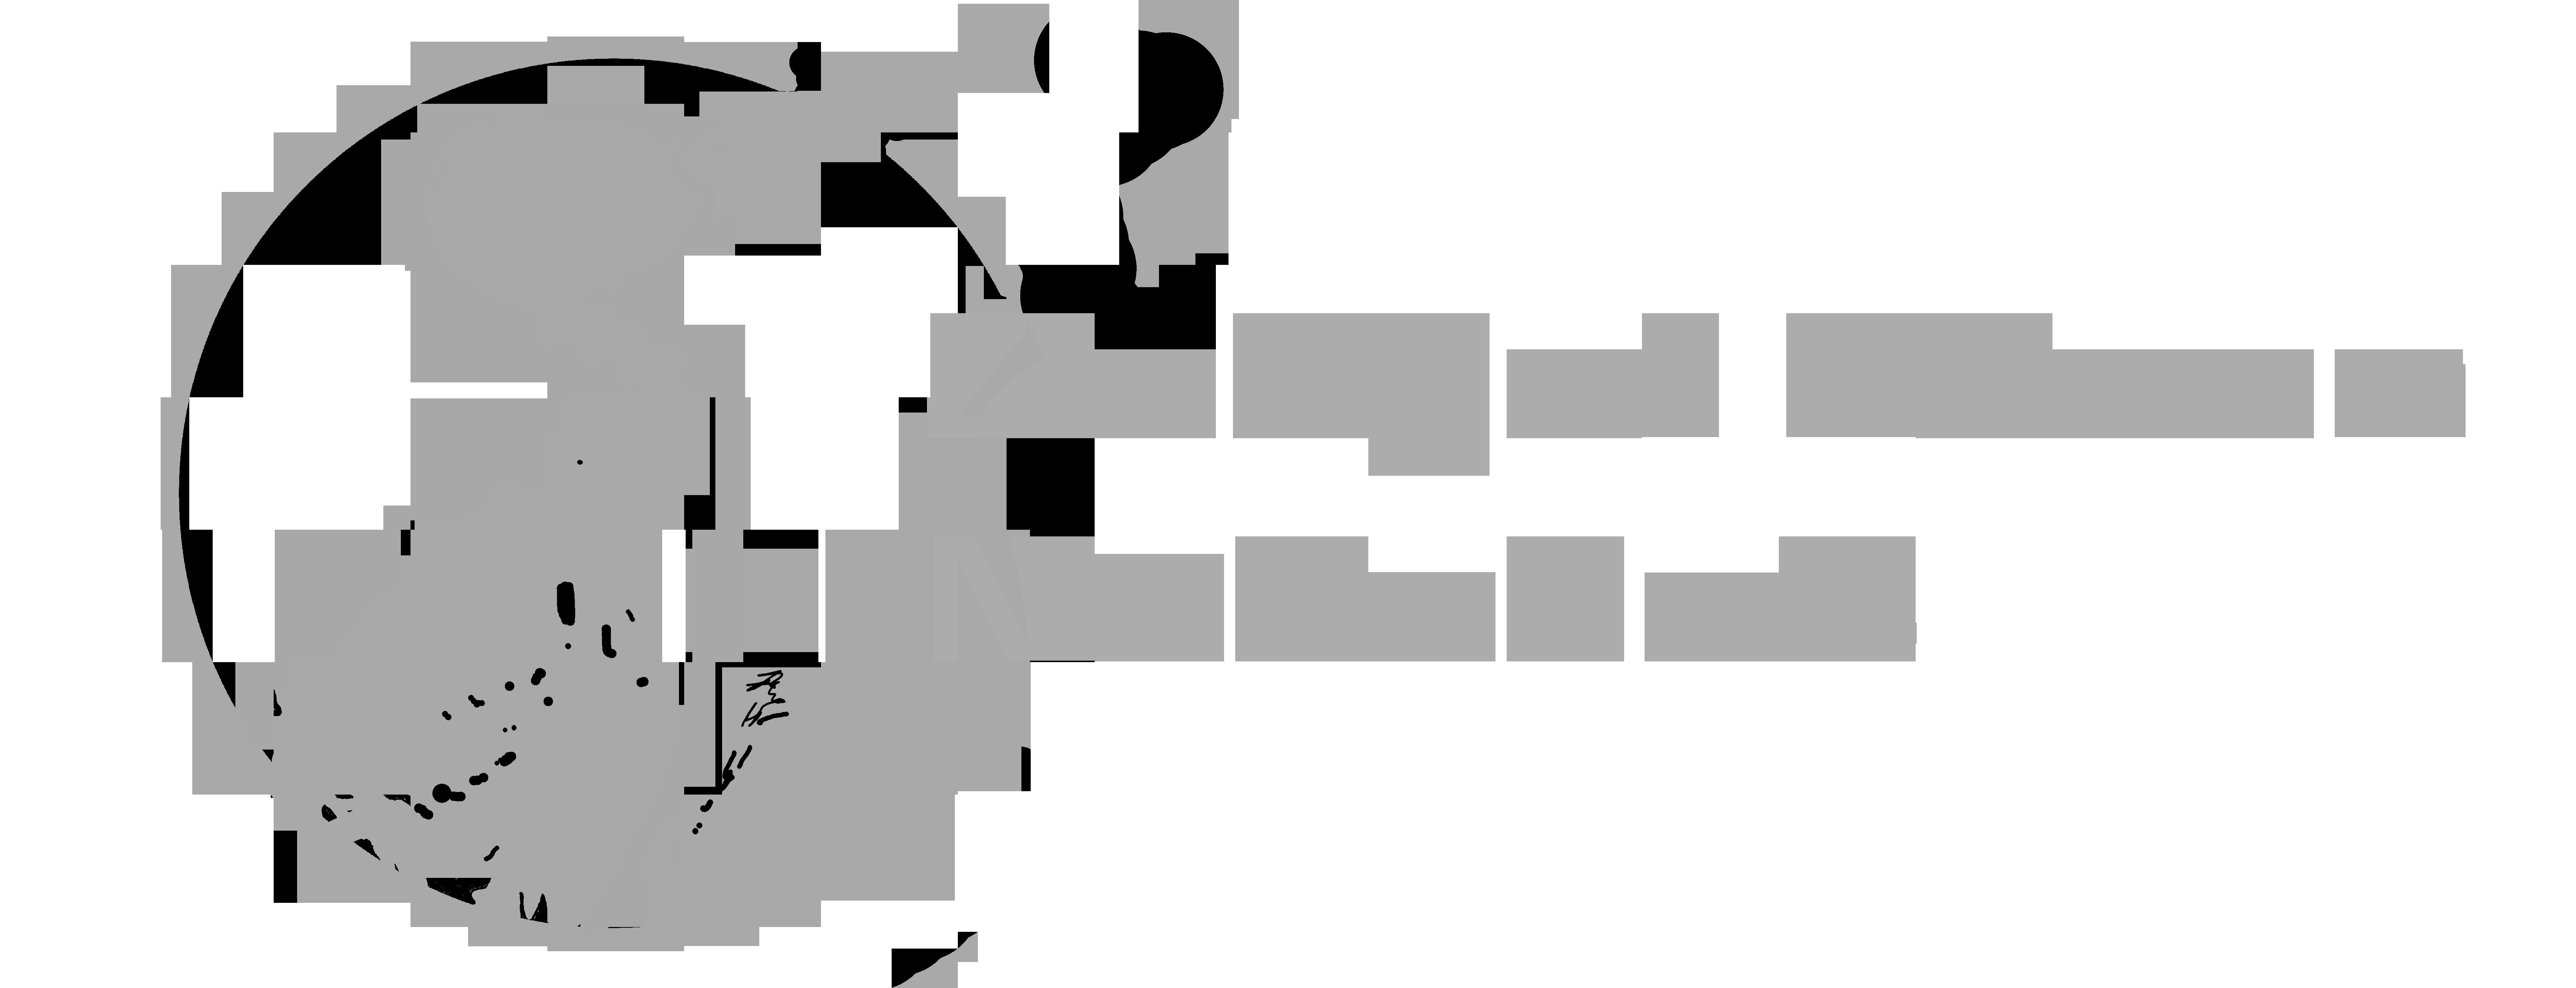 Zoological Museum Netherlands